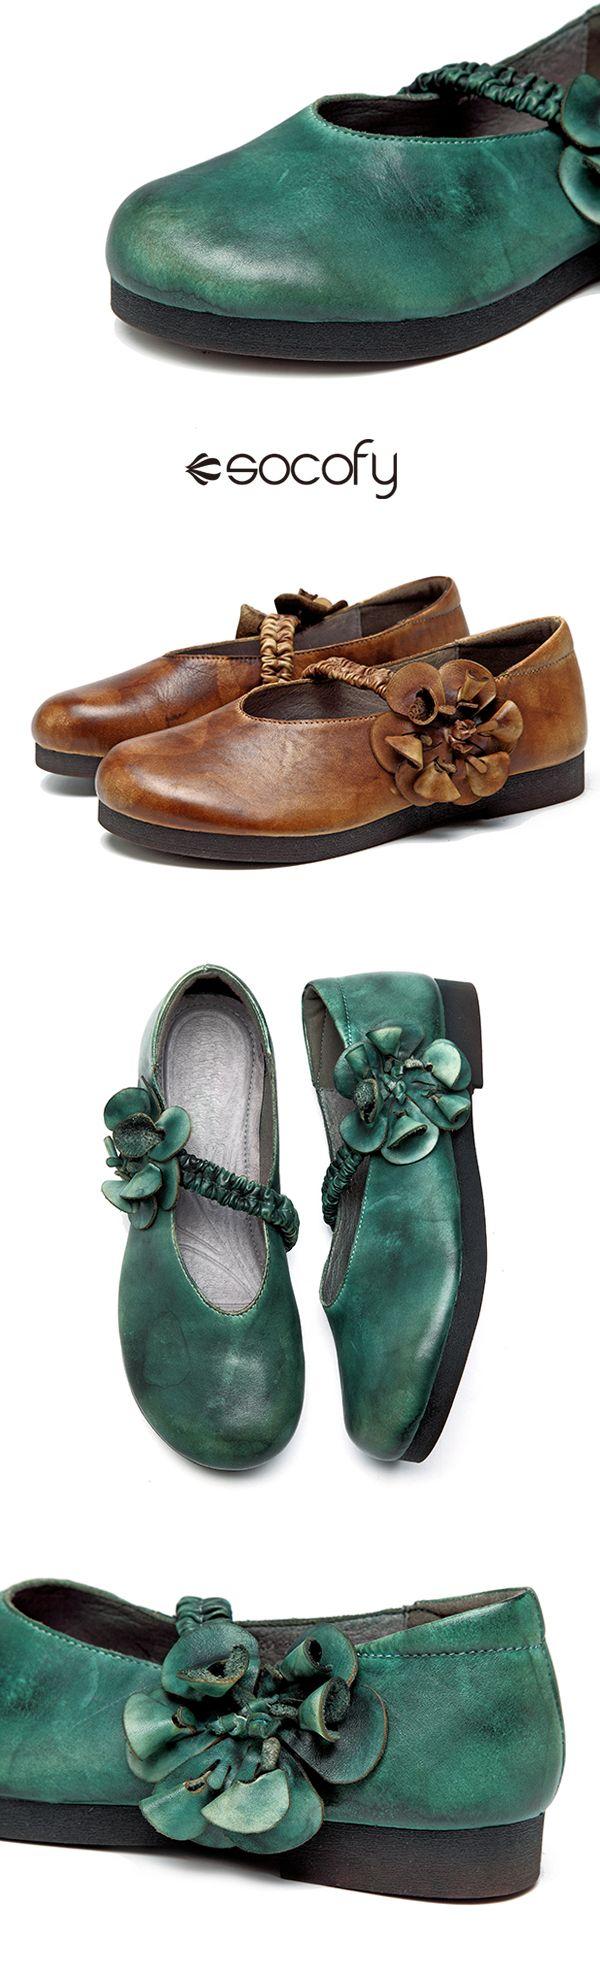 "【45% OFF】 SOCOFY ""Sooo Comfy"" Retro Soft Flower Hook Loop Flat Leather Shoes"